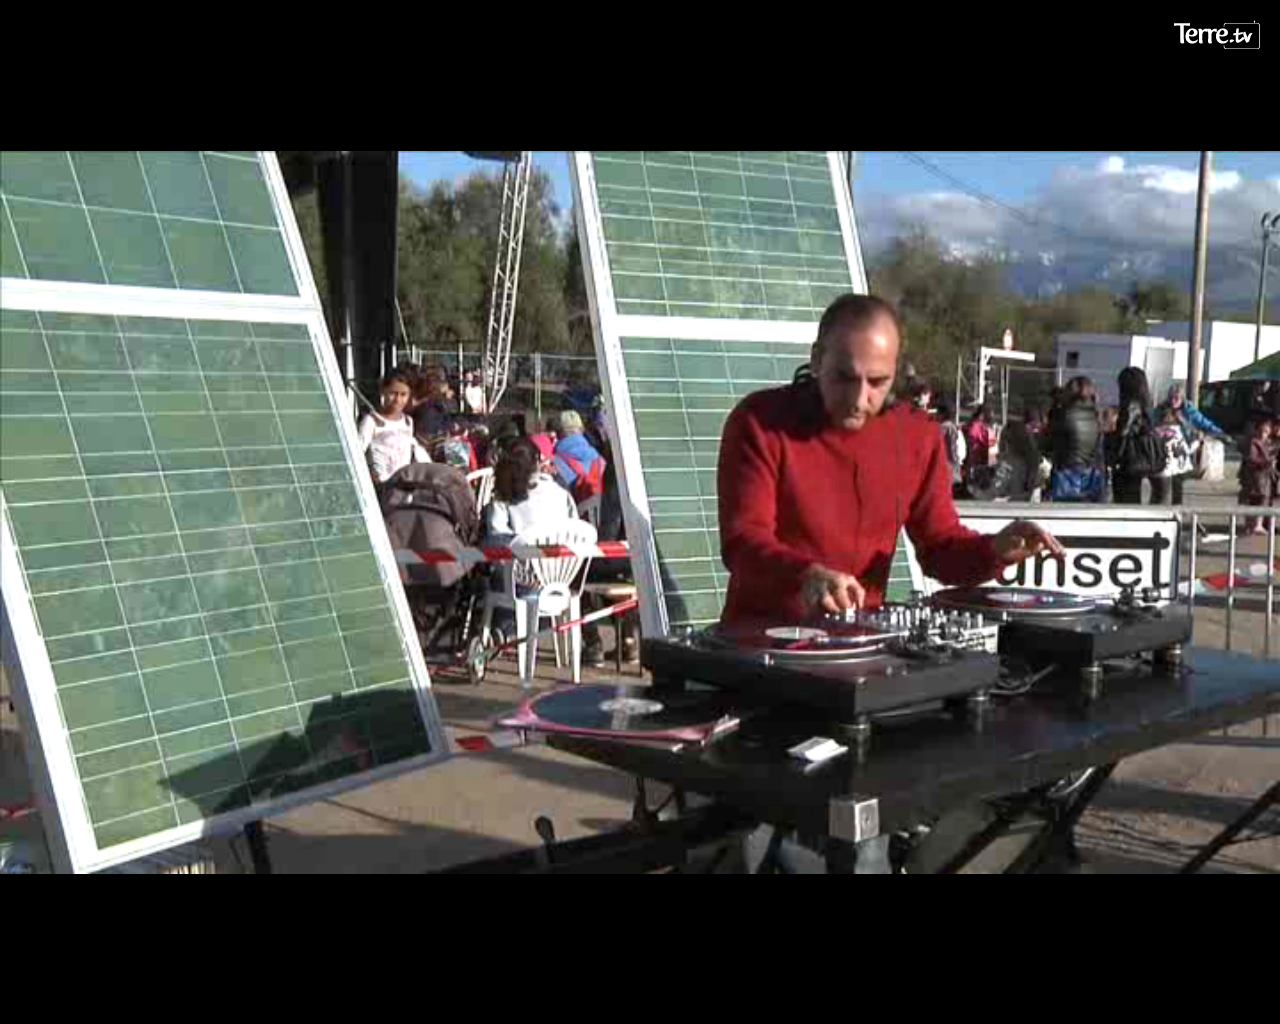 DJ solaire